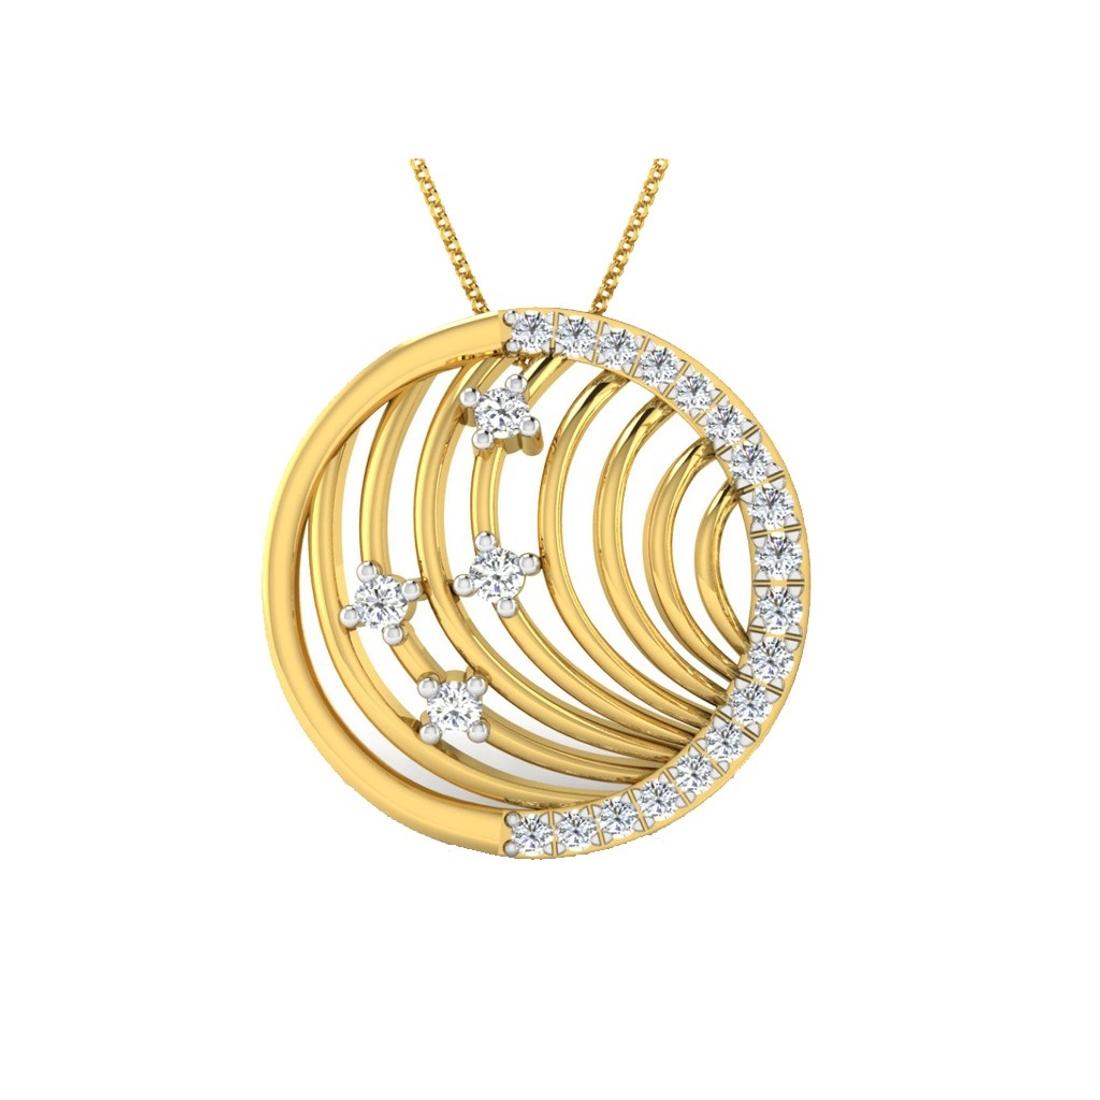 Sarvada Jewels' The Liri Circular Pendant